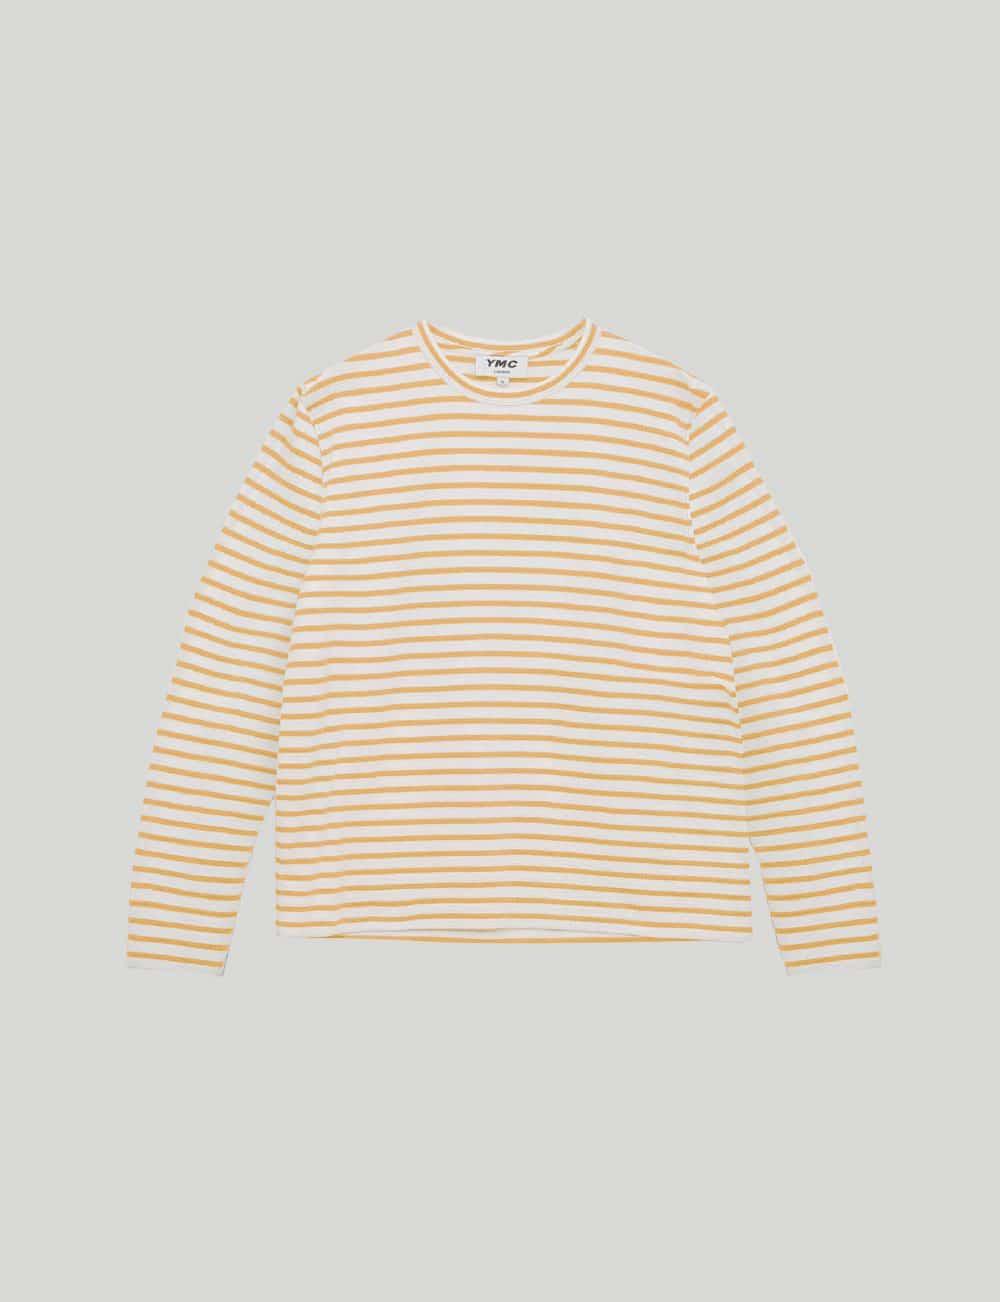 YMC - Castart - Cotton Crepe sweatshirt - Yellow